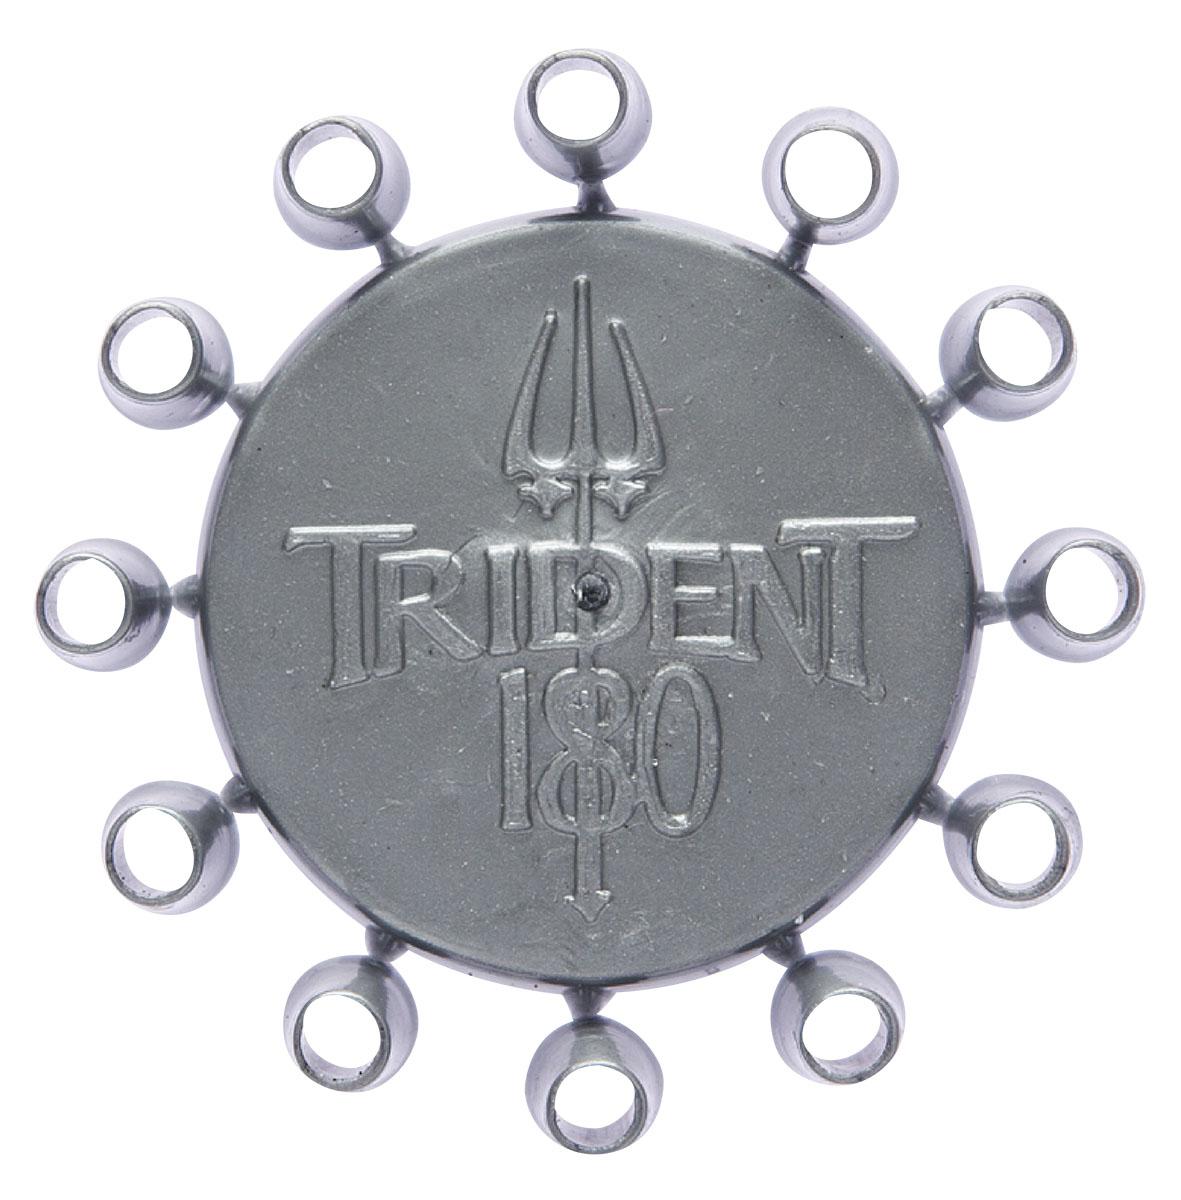 Winmau Trident 180 Silver